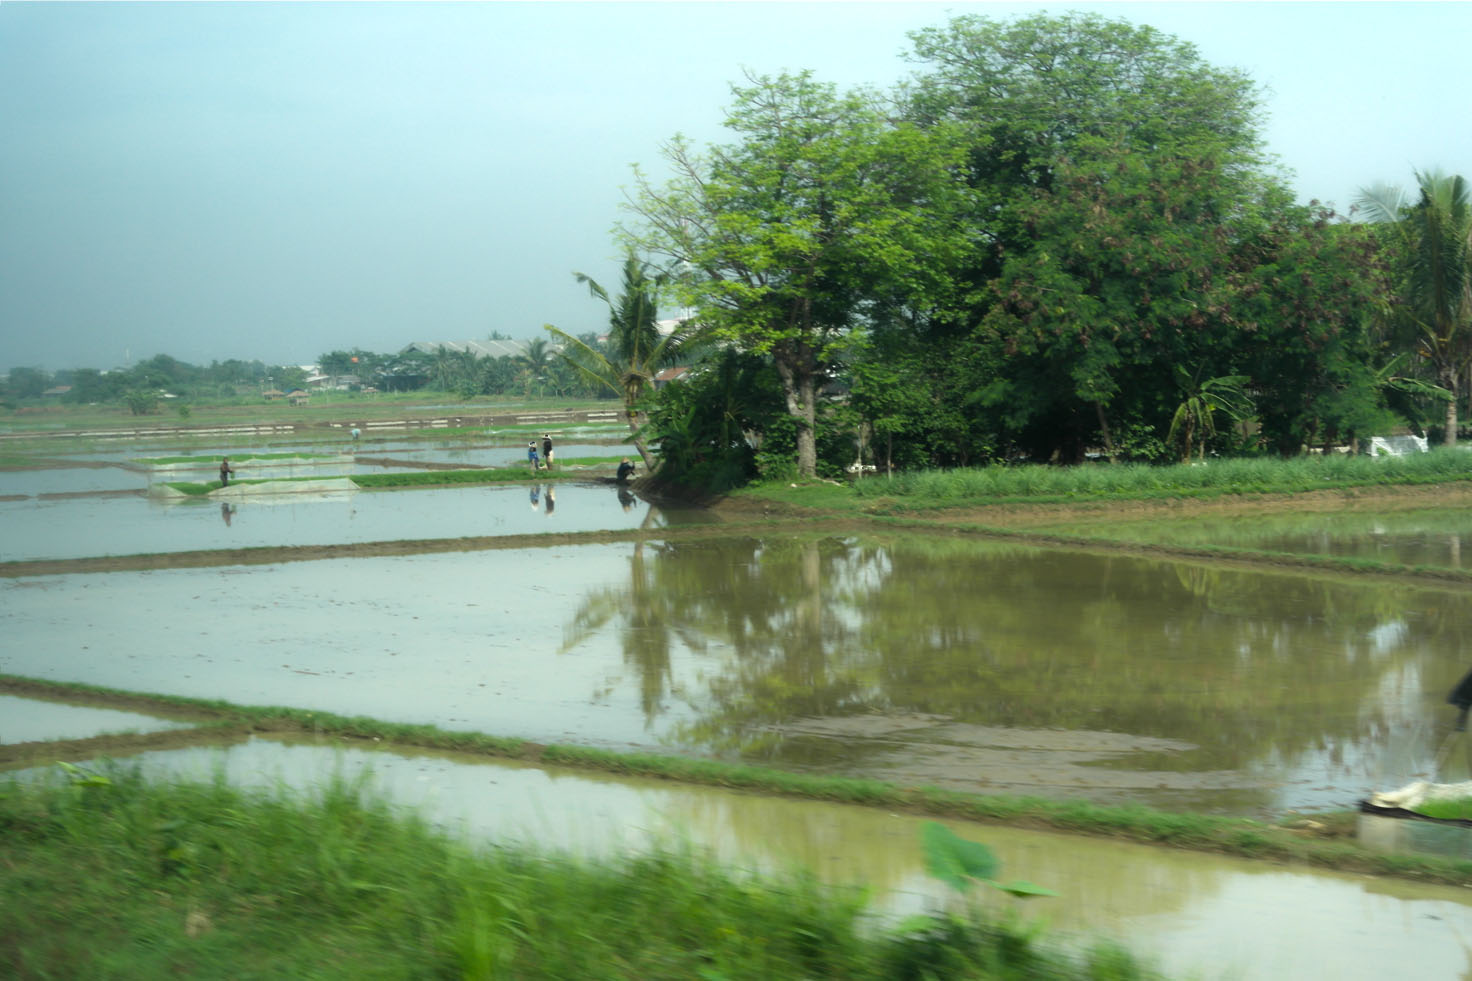 Zugfahrt von Jakarta nach Yogyakarta